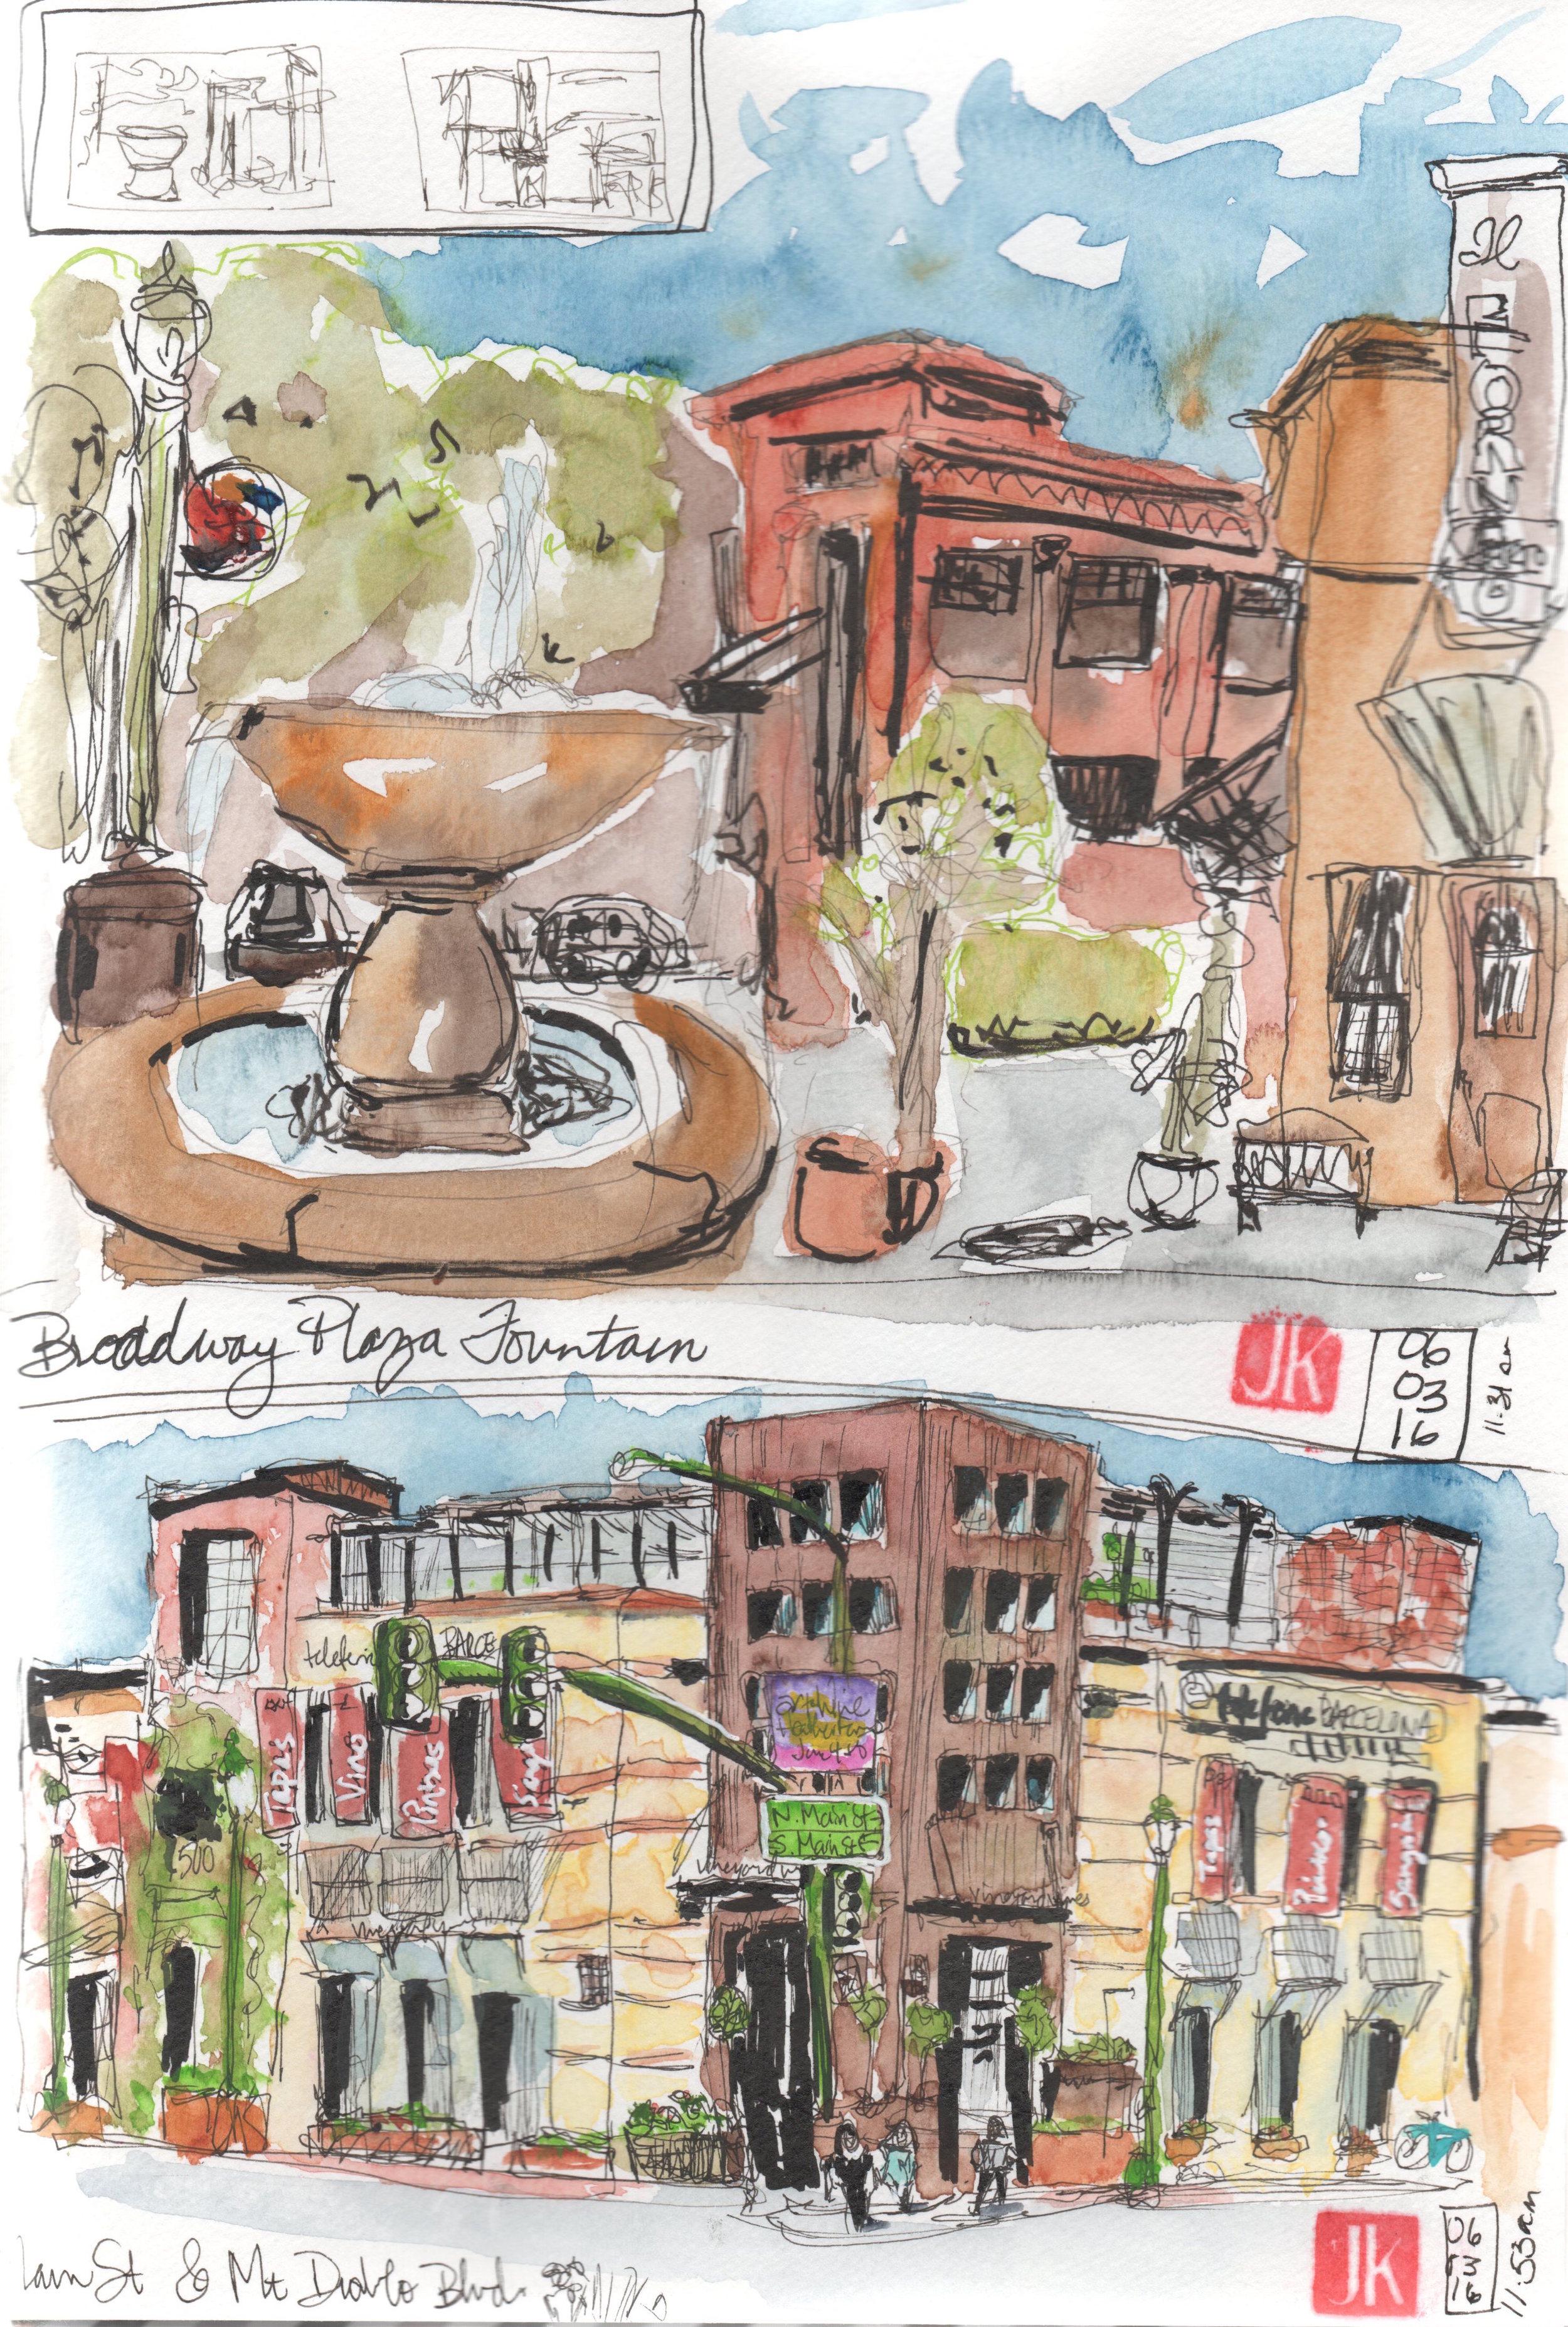 Liberty Bell Plaza -- Main St.& Mt. Diablo Blvd.